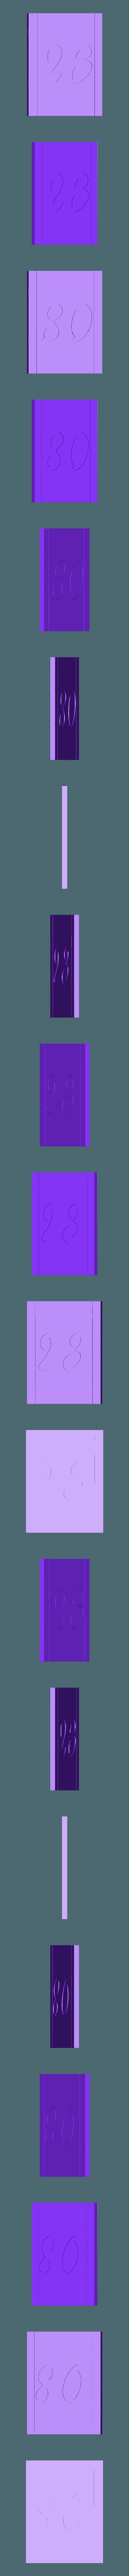 23_-_8.stl Download free SCAD file Perpetual Flip Calendar (W/ Customizable Font) • 3D printable model, Dsk